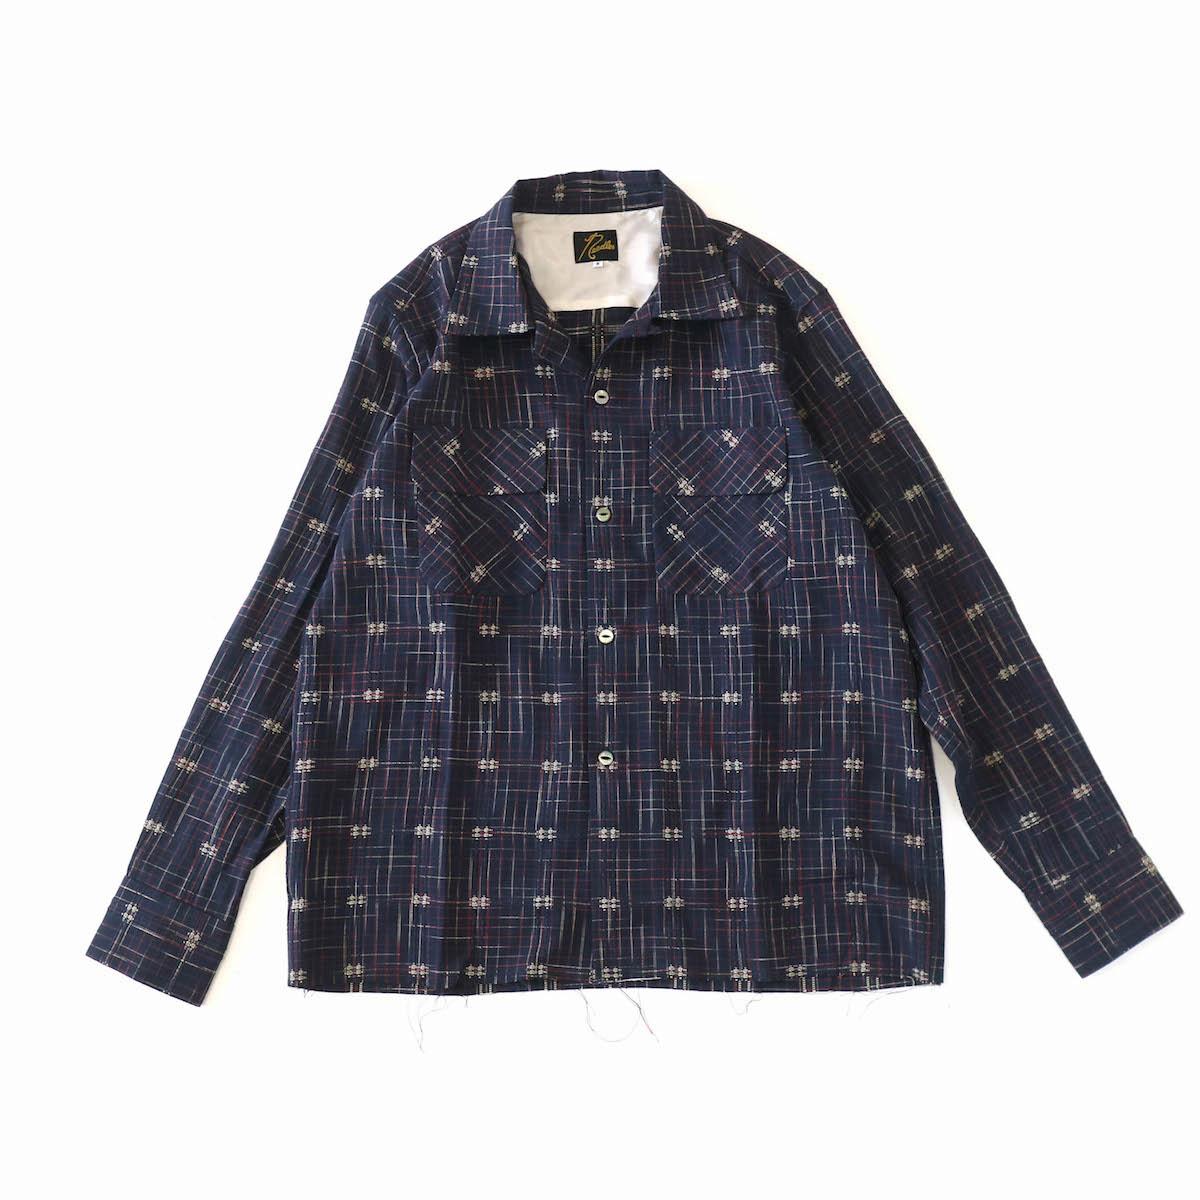 Needles / Classic Shirt - Rayon Dobby Plaid